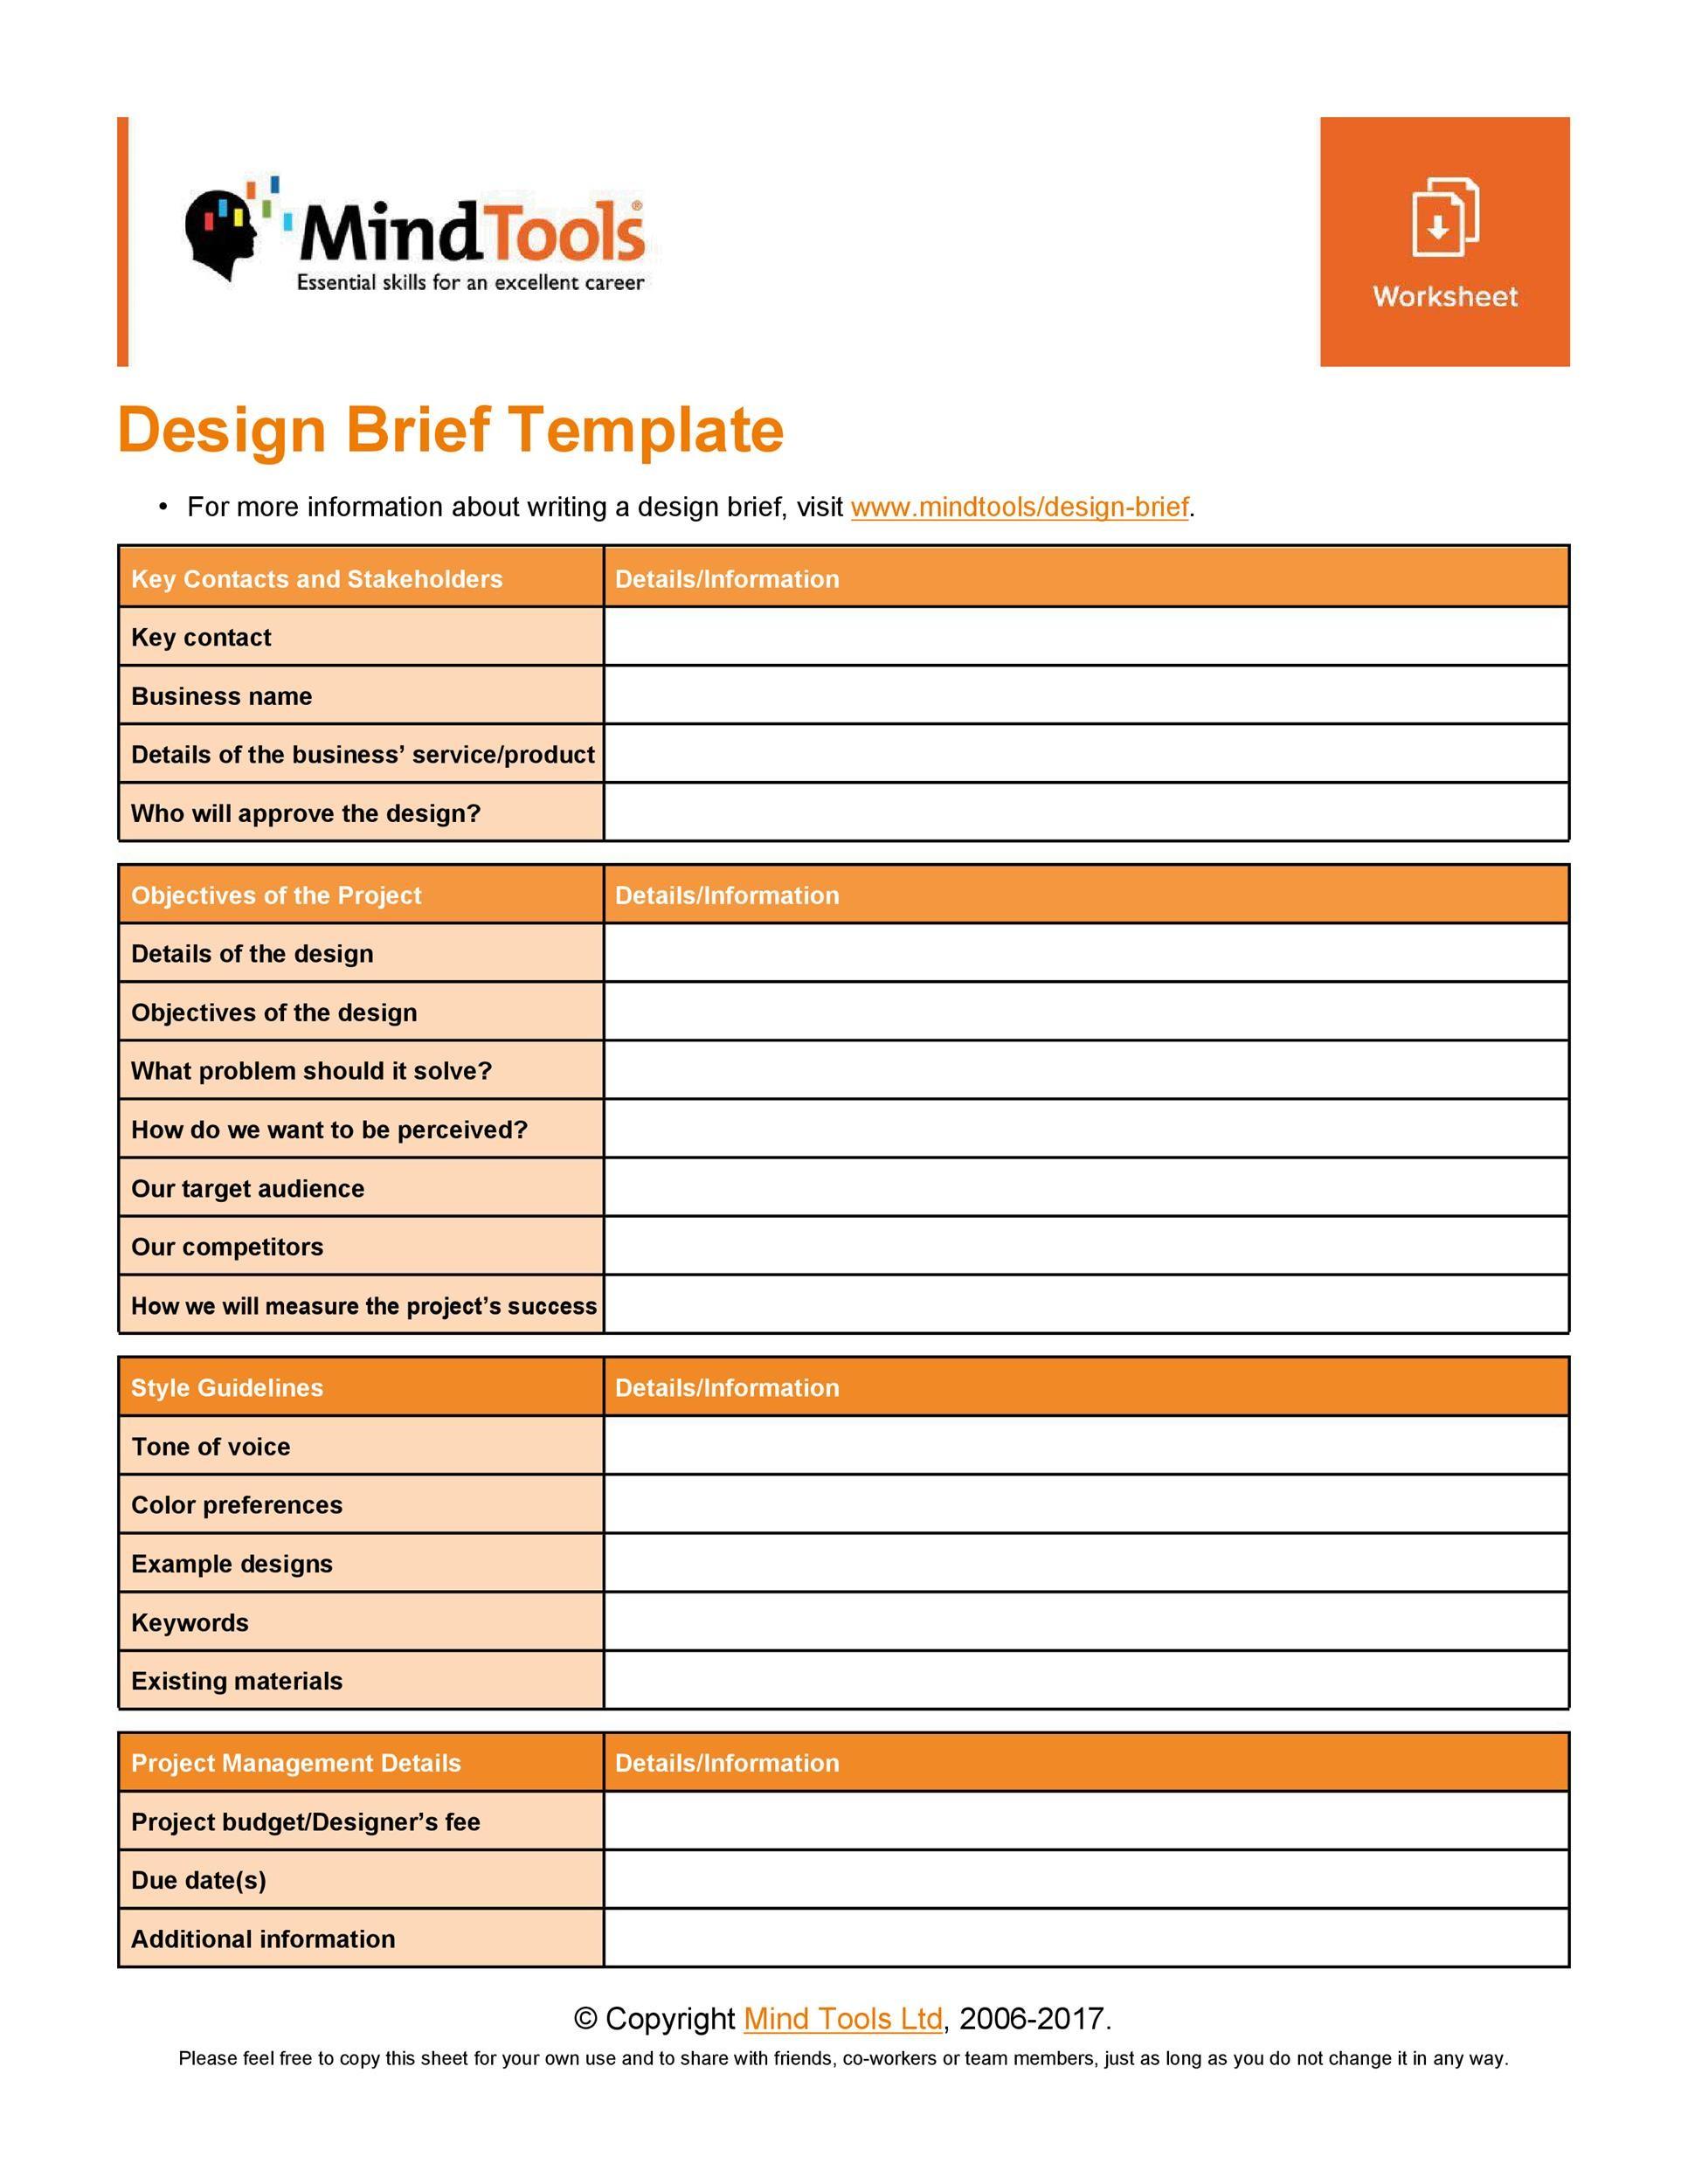 Free design brief template 22